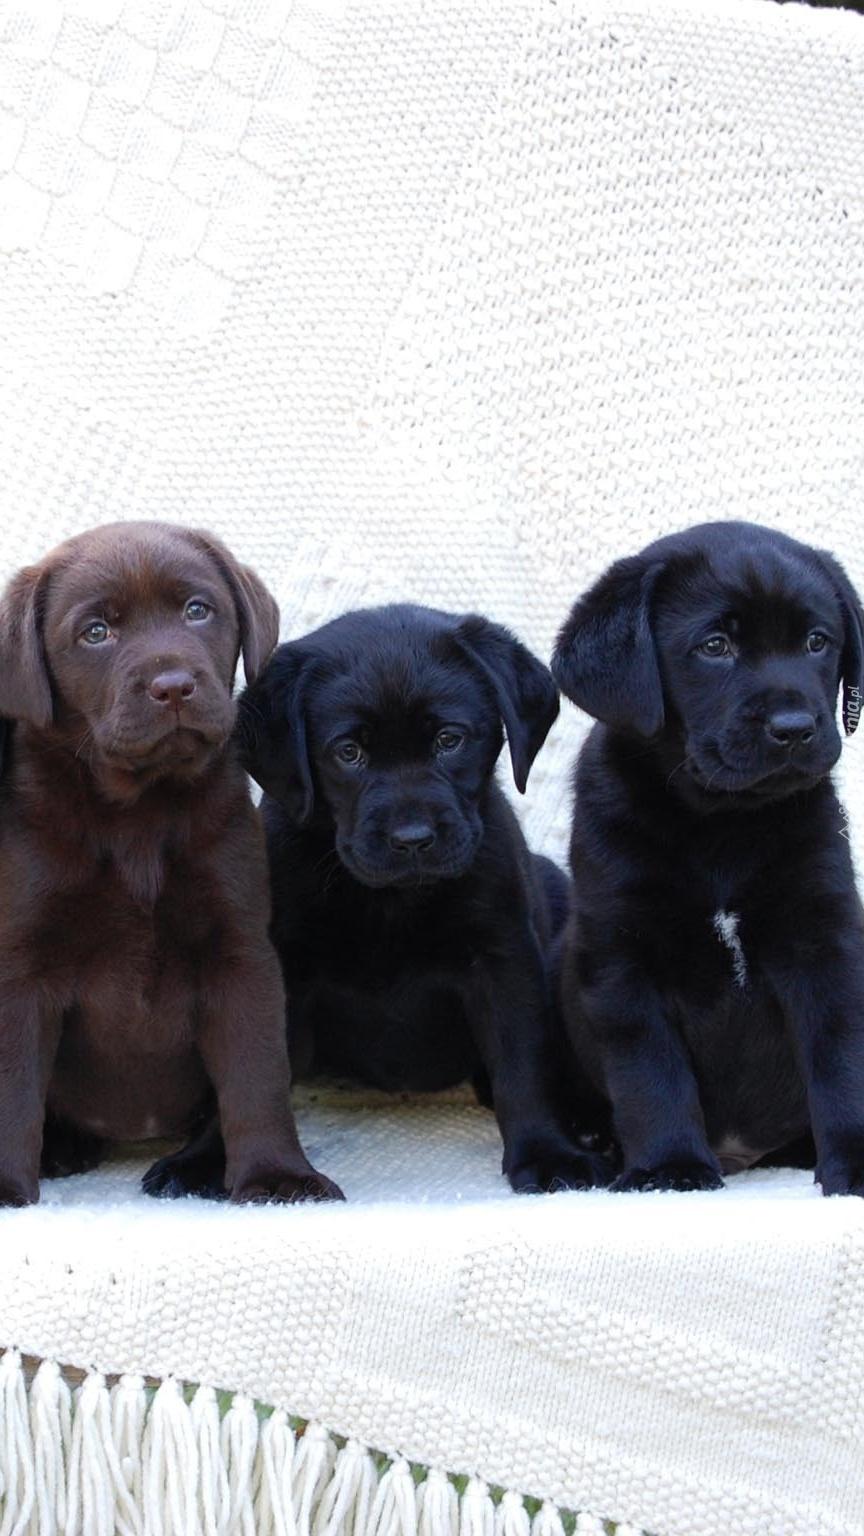 Małe labradory na ławce